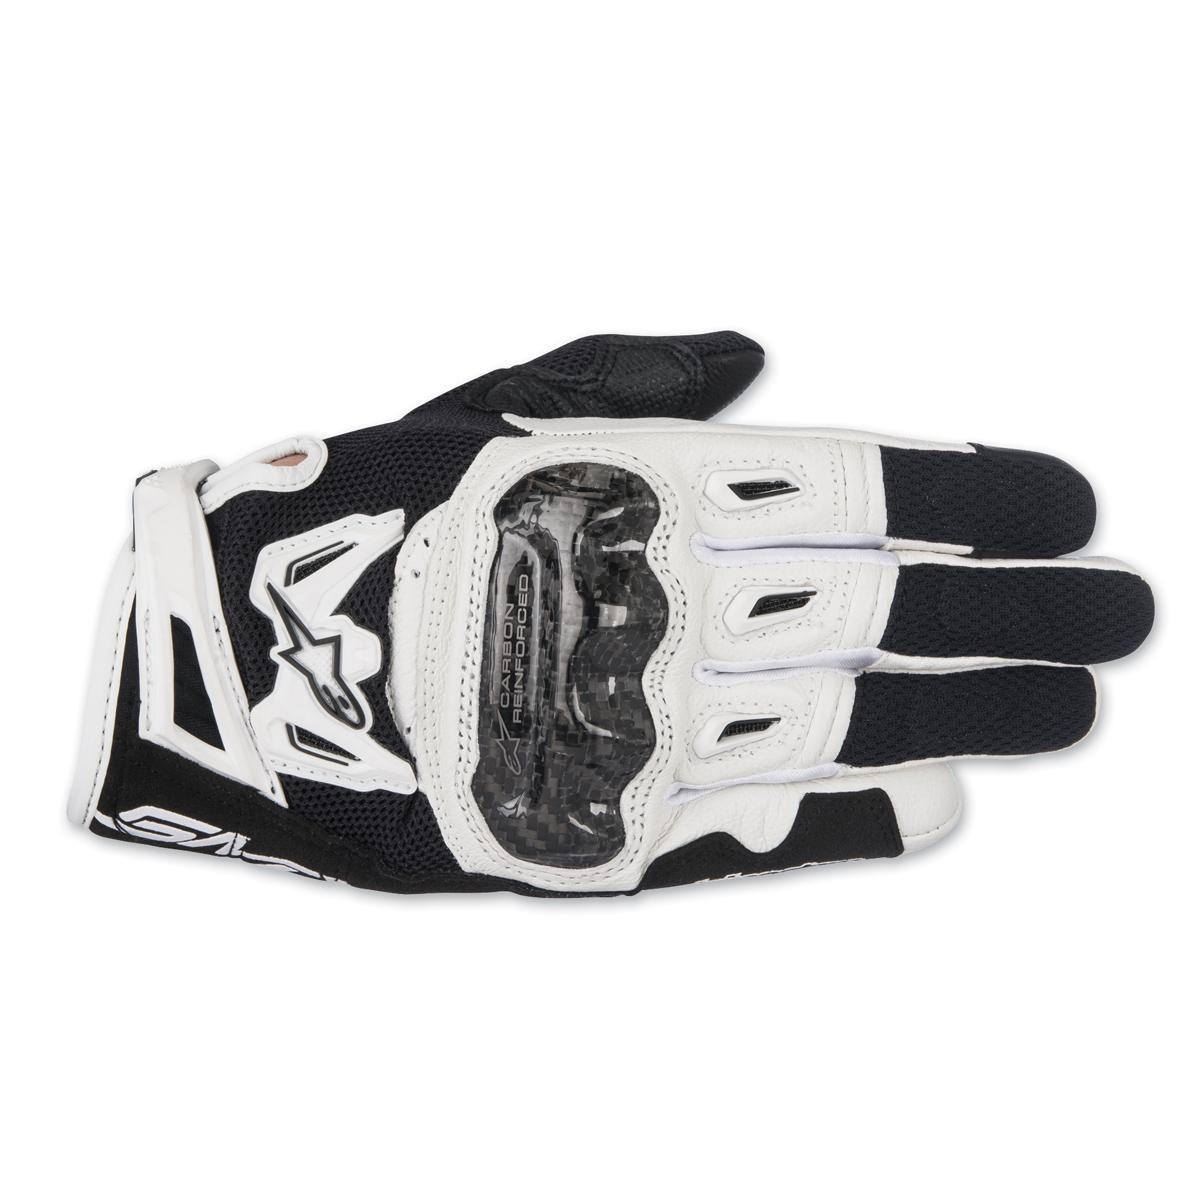 Alpinestars Women's Stella SMX-2 v2 Air Carbon Black/White Gloves